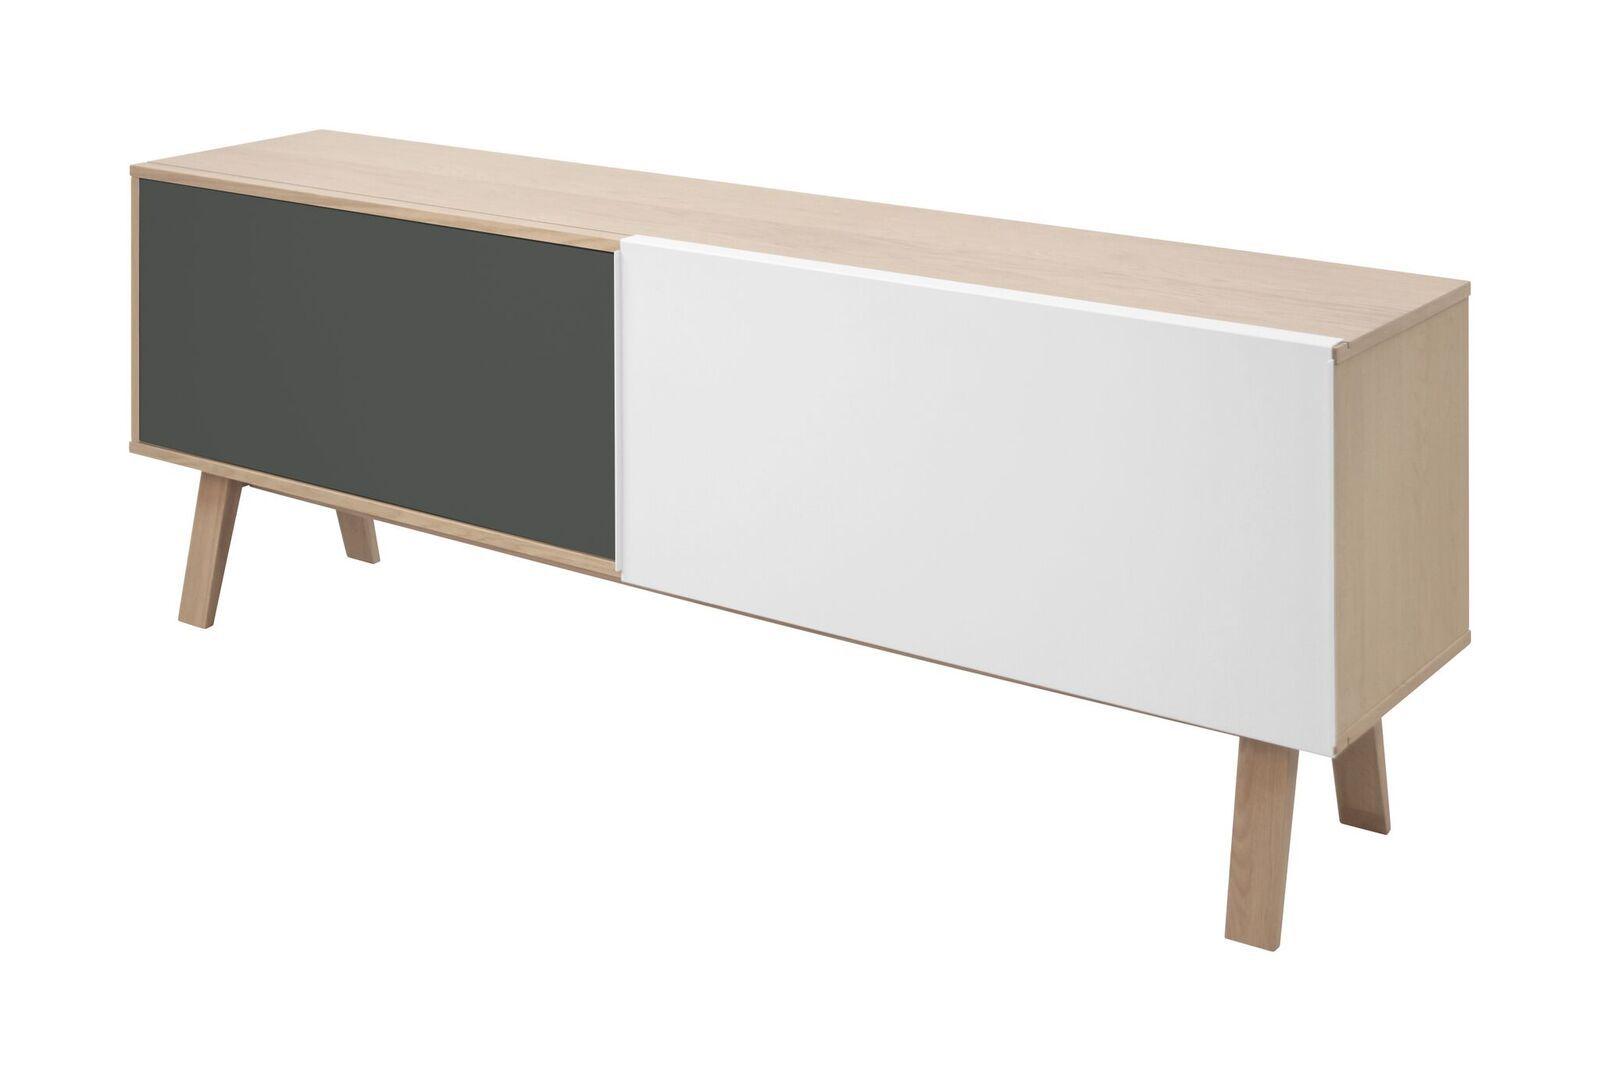 miso-dressoir-kast-antraciet_zwart_miso-levaleva-interstil-staal-eiken-fineer-wit_1.jpg